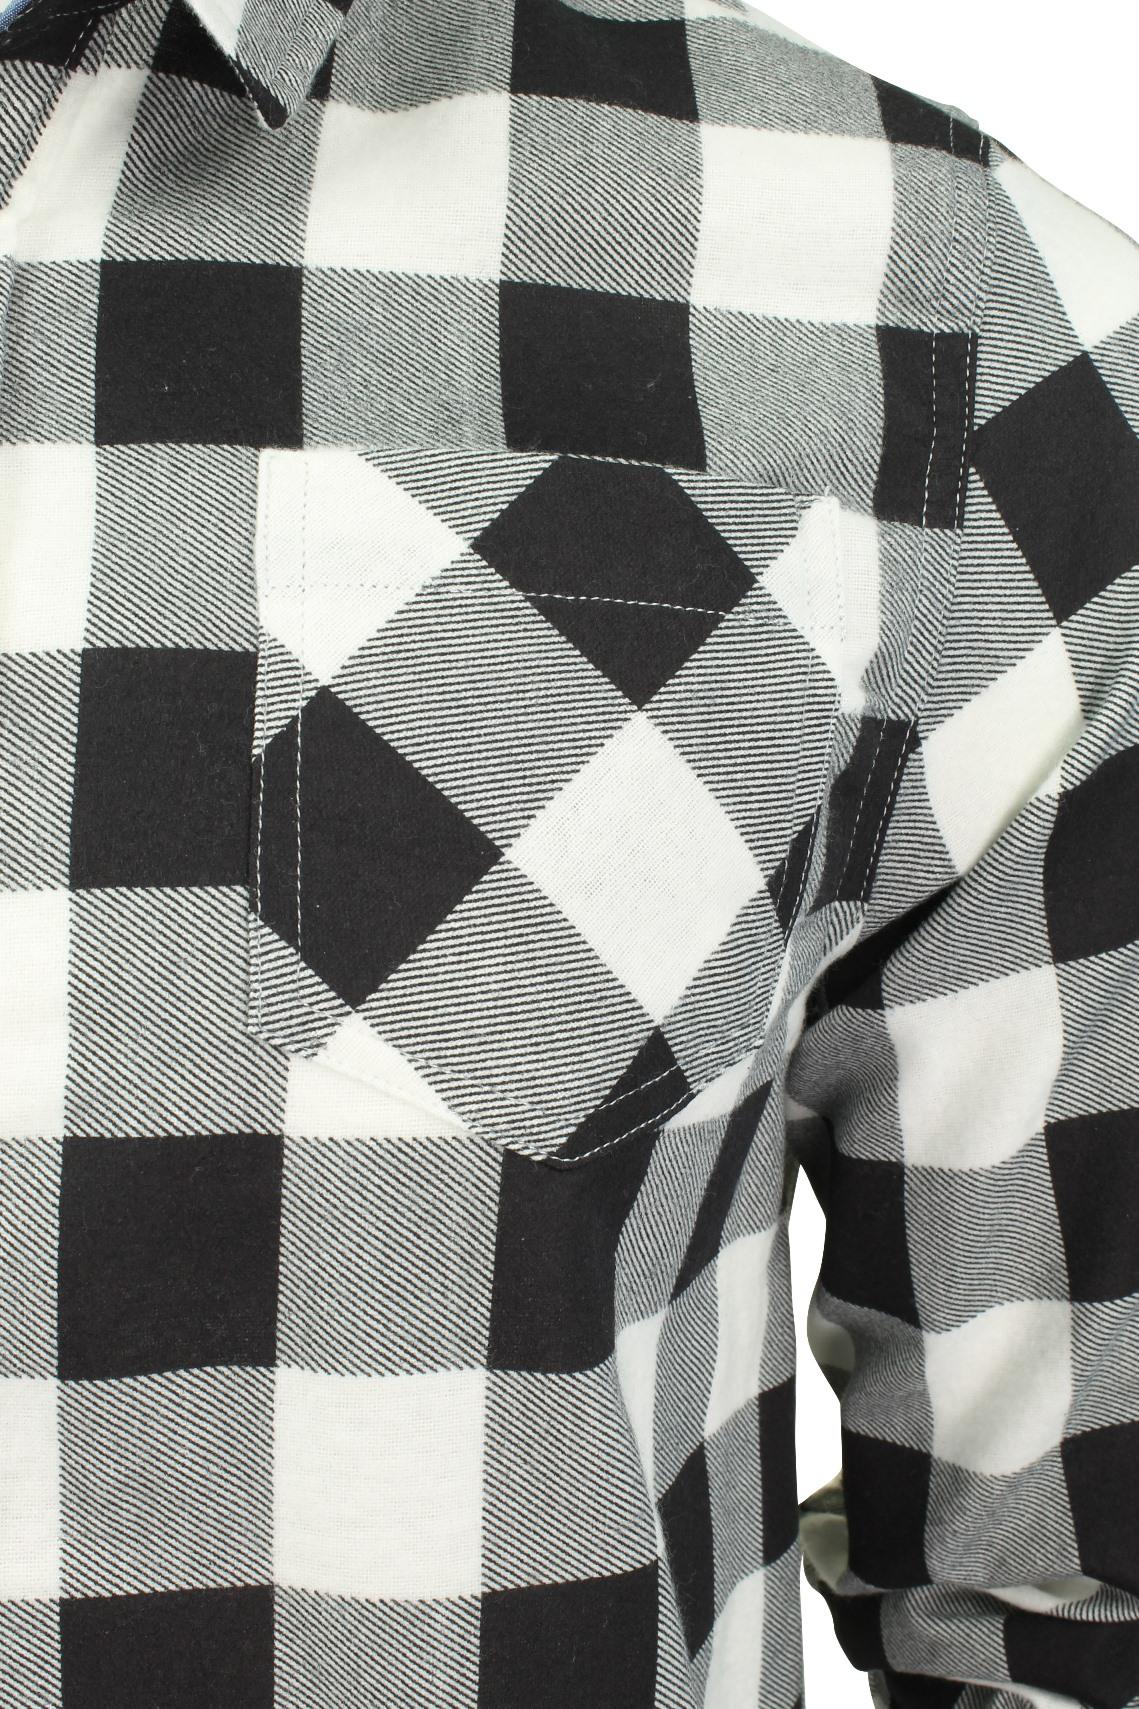 Brave-Soul-Brushed-Flannel-Check-Cotton-Jack-Shirt-Long-Sleeved thumbnail 23